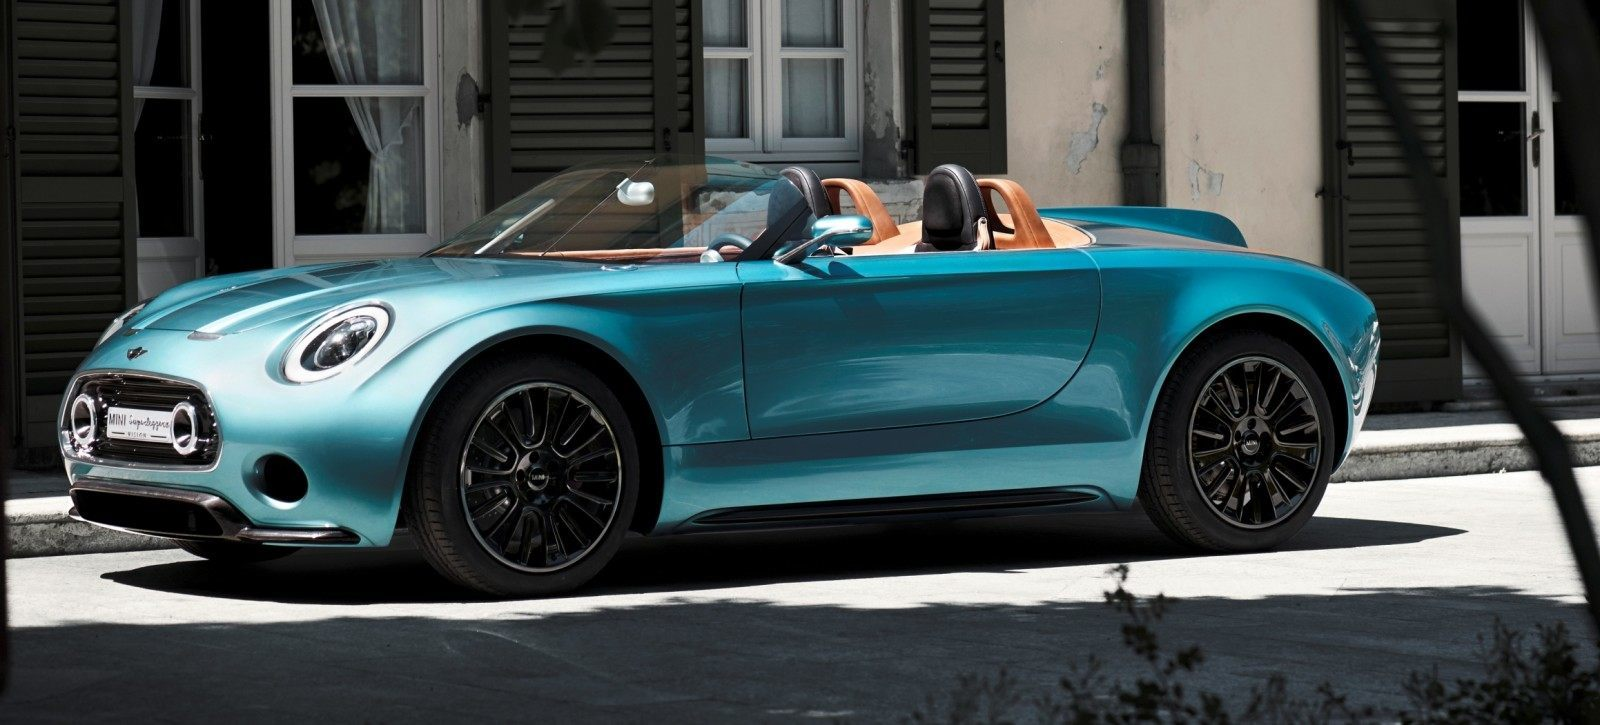 2014 MINI Superleggera Concept is Dreamy Roofless Speedster6